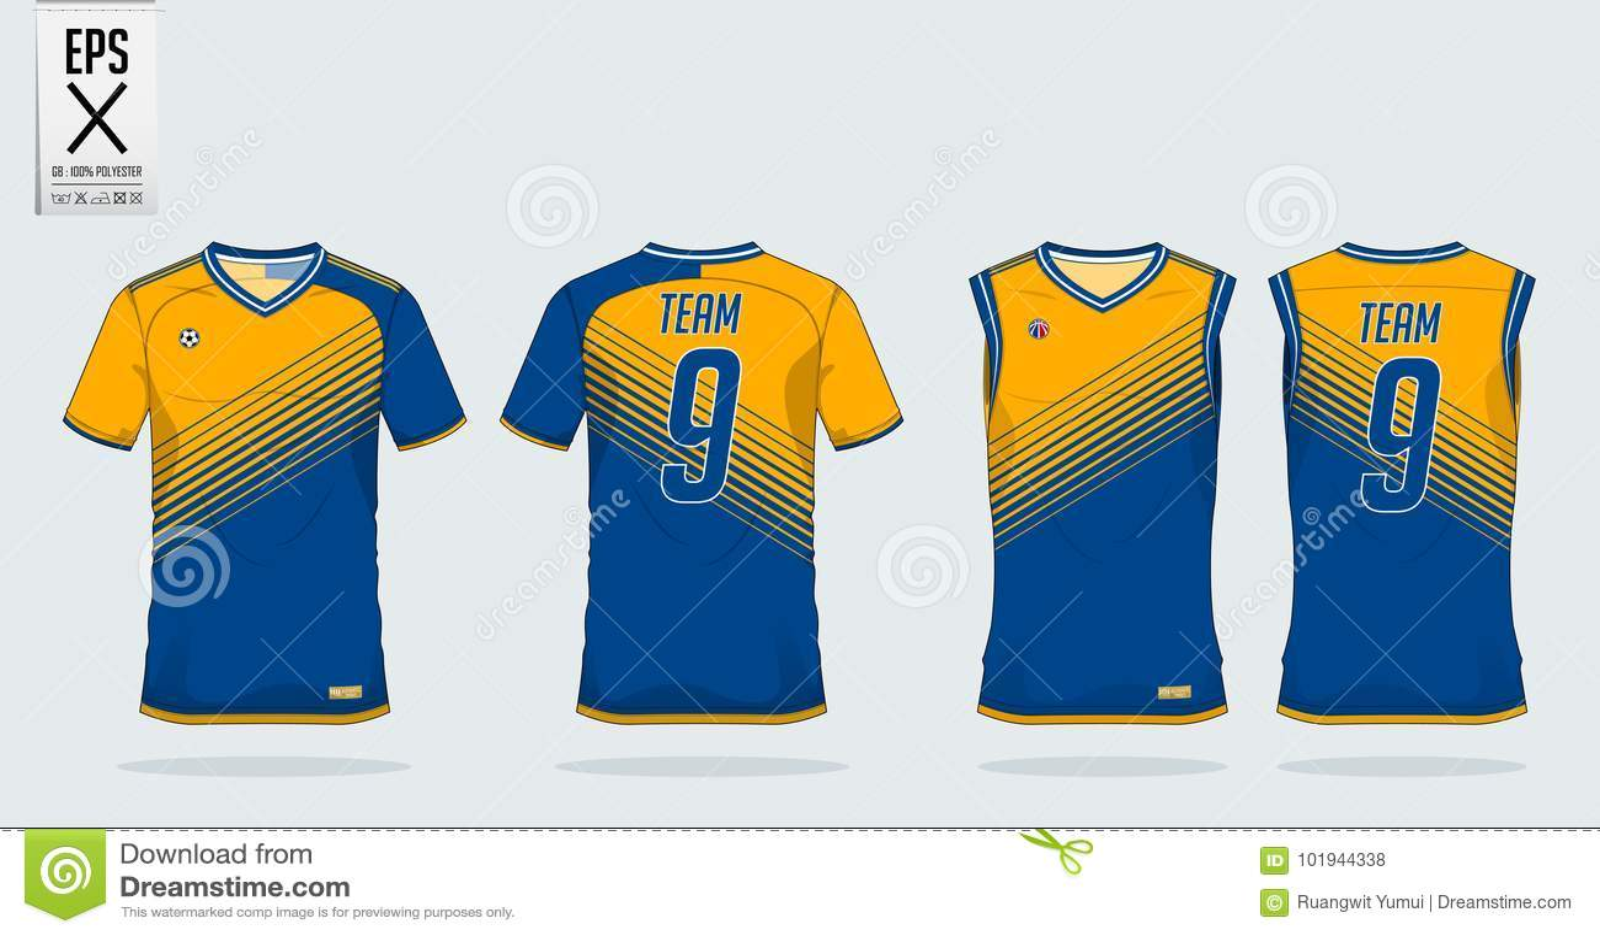 T恤杉体育足球球衣、橄榄球成套工具和无袖衫的设计模板篮球球衣的 在前面和后面看法的制服